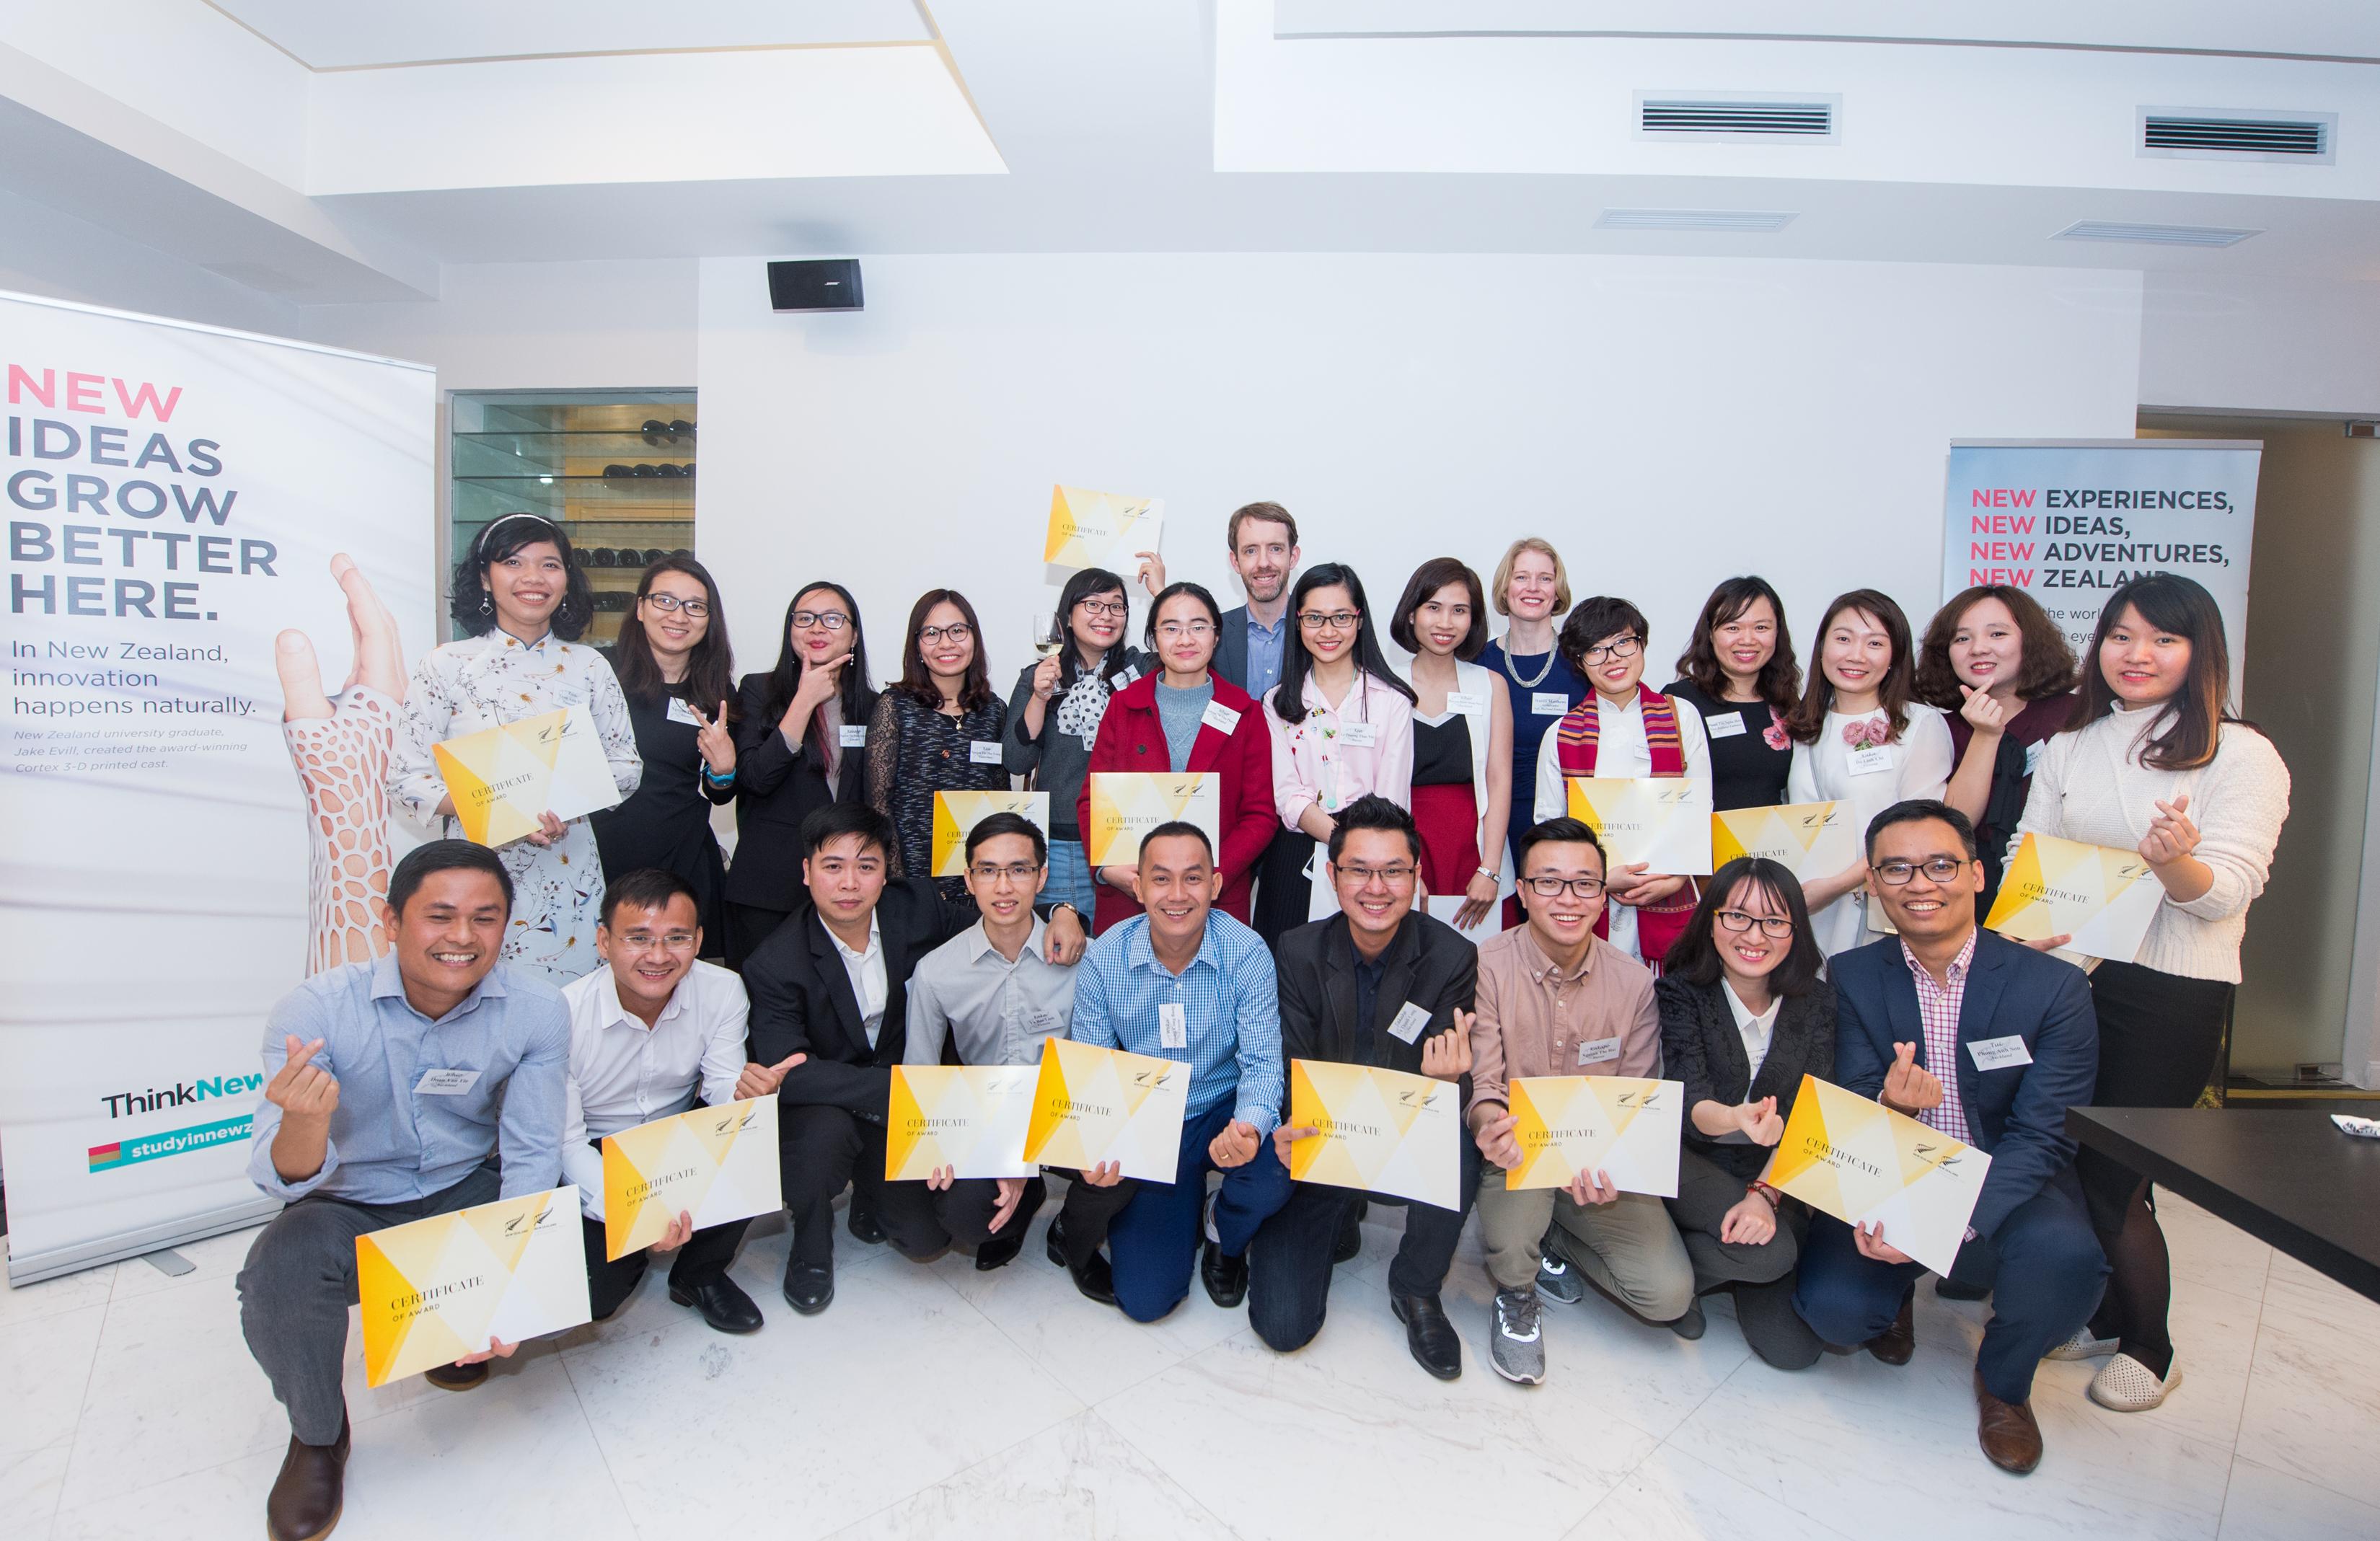 28 vietnamese scholars heading to new zealand to study in 2018